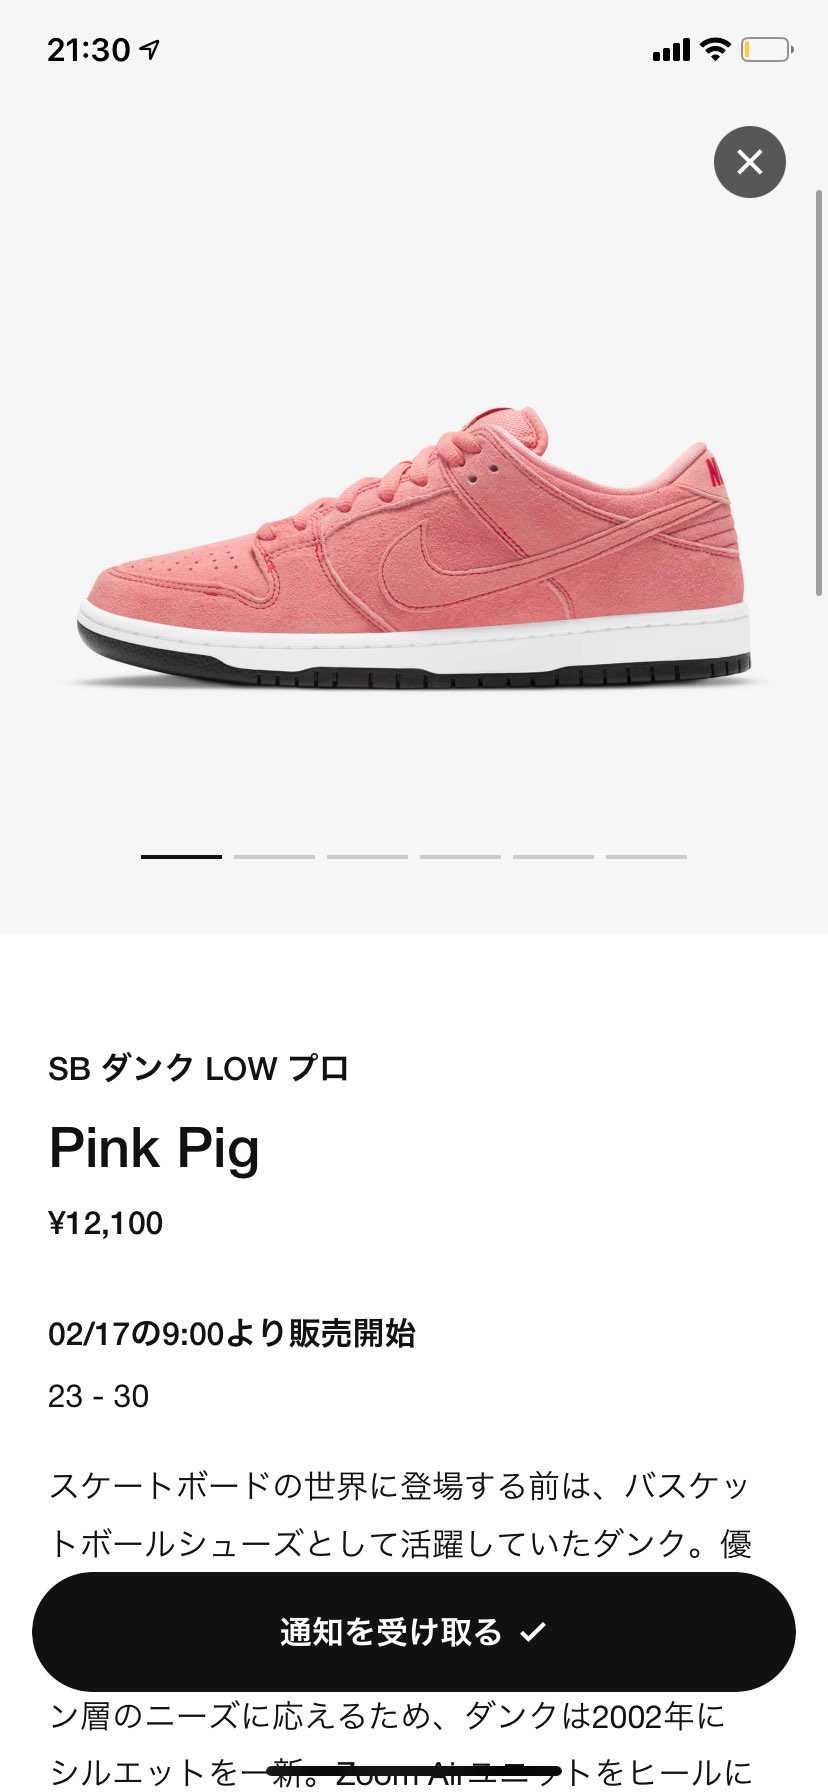 2/17 9:00 SNKRS & Nike App